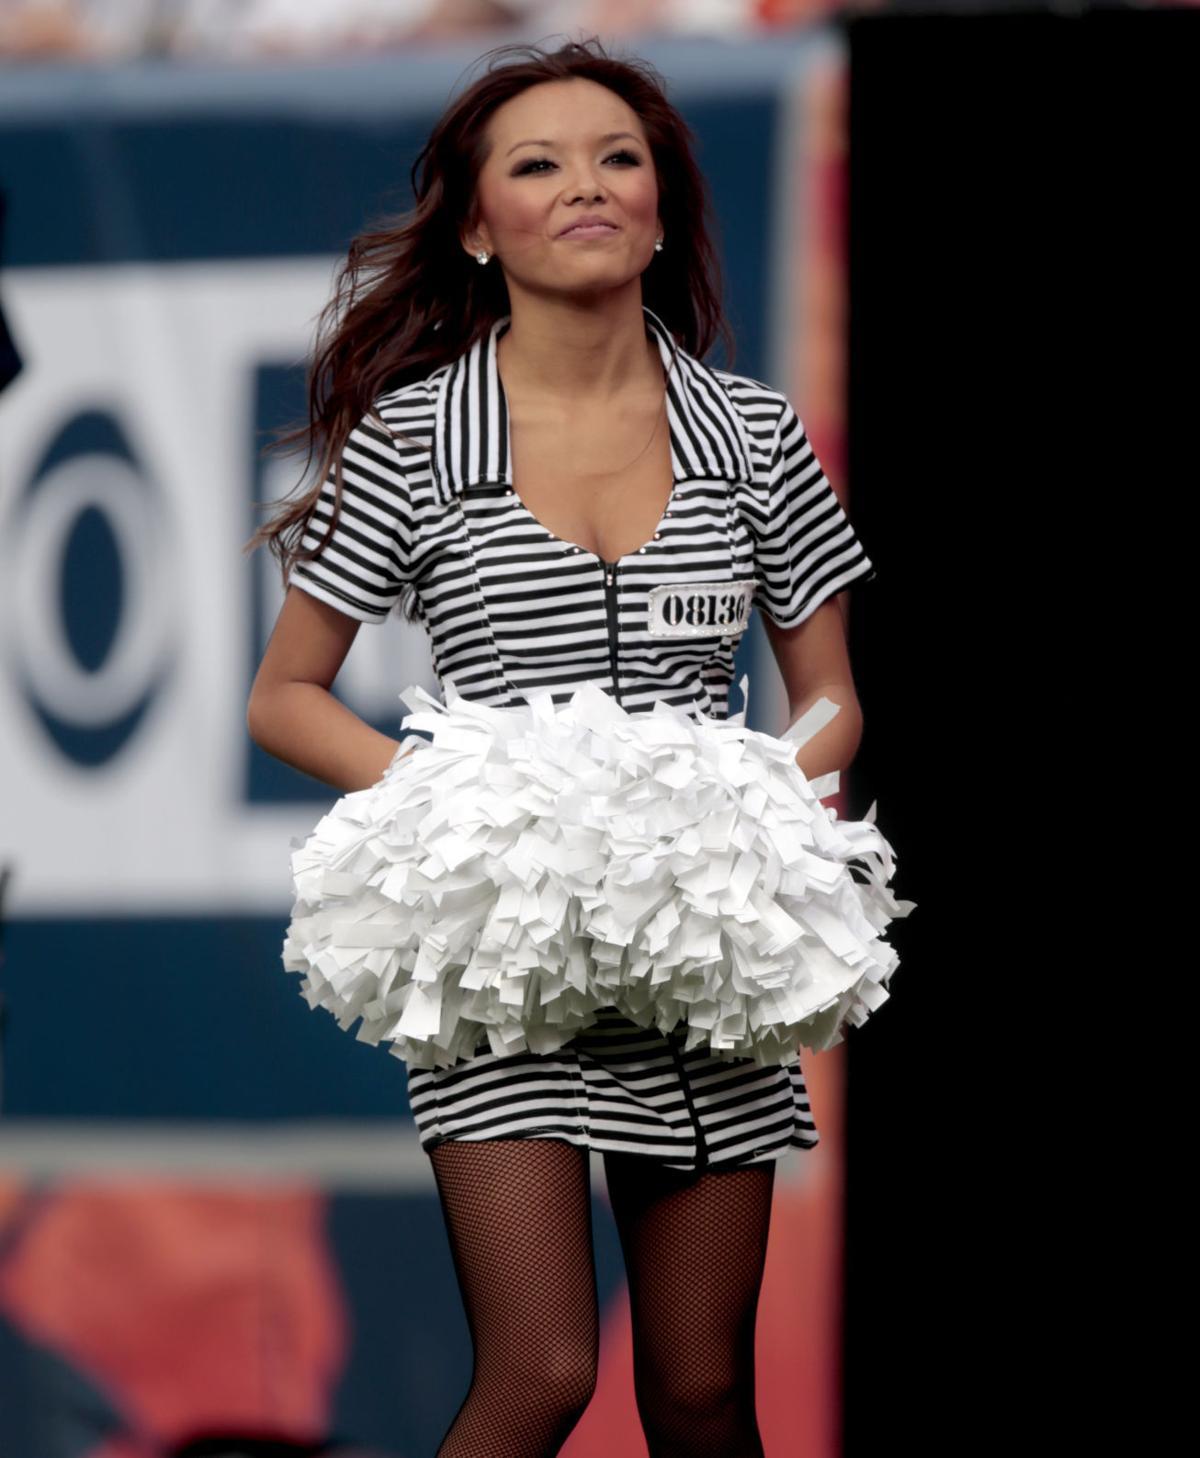 San Diego Chargers Cheerleaders Pictures: NFL Cheerleaders Get In The Halloween Spirit